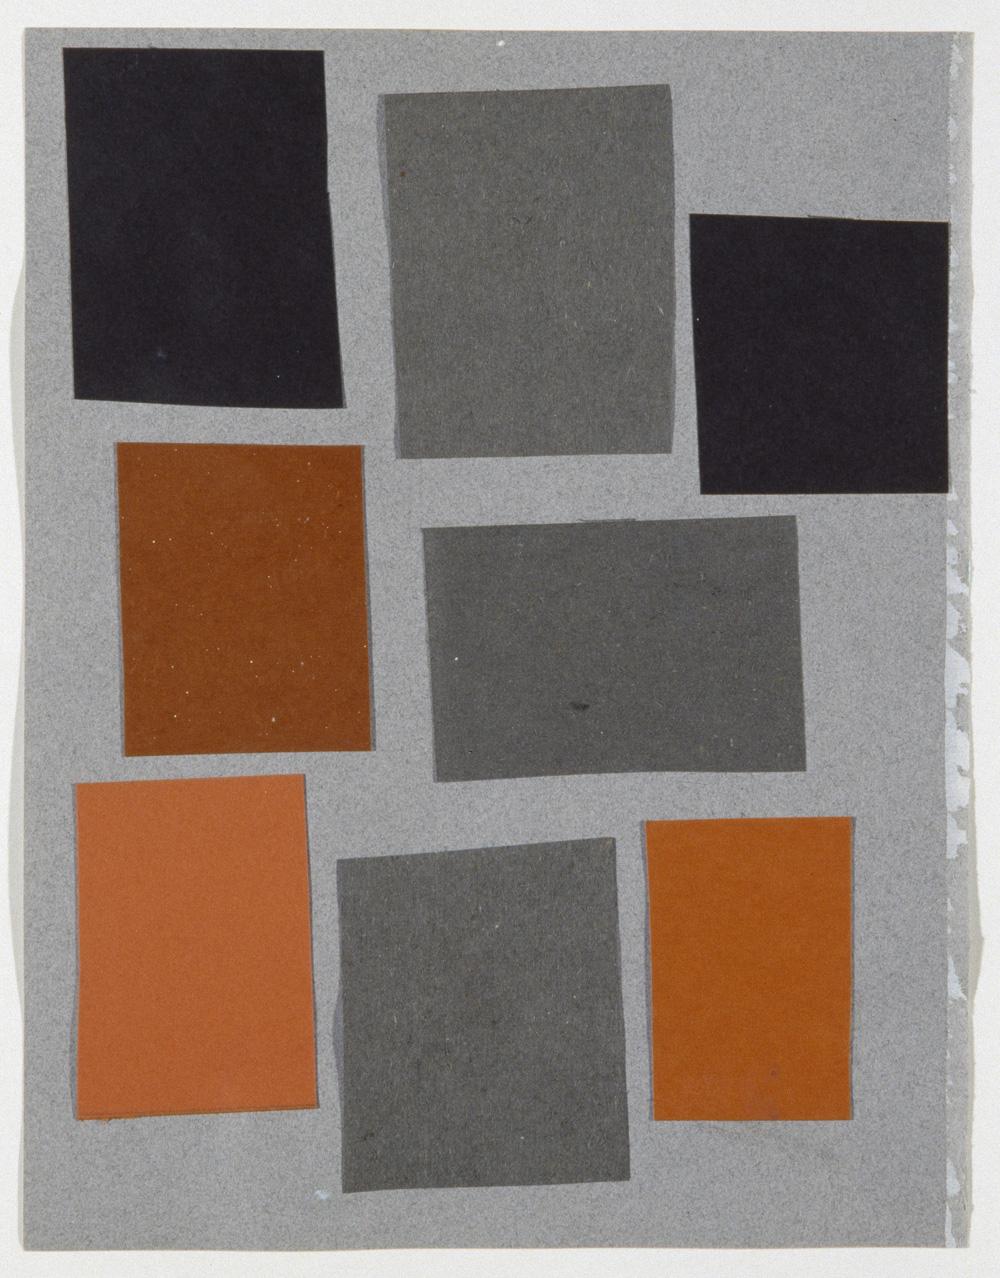 Richard Hawkins, Abstract Array 1 ,2006,Collage,27.7 x 21 cm, Courtesy Corvi-Mora, London